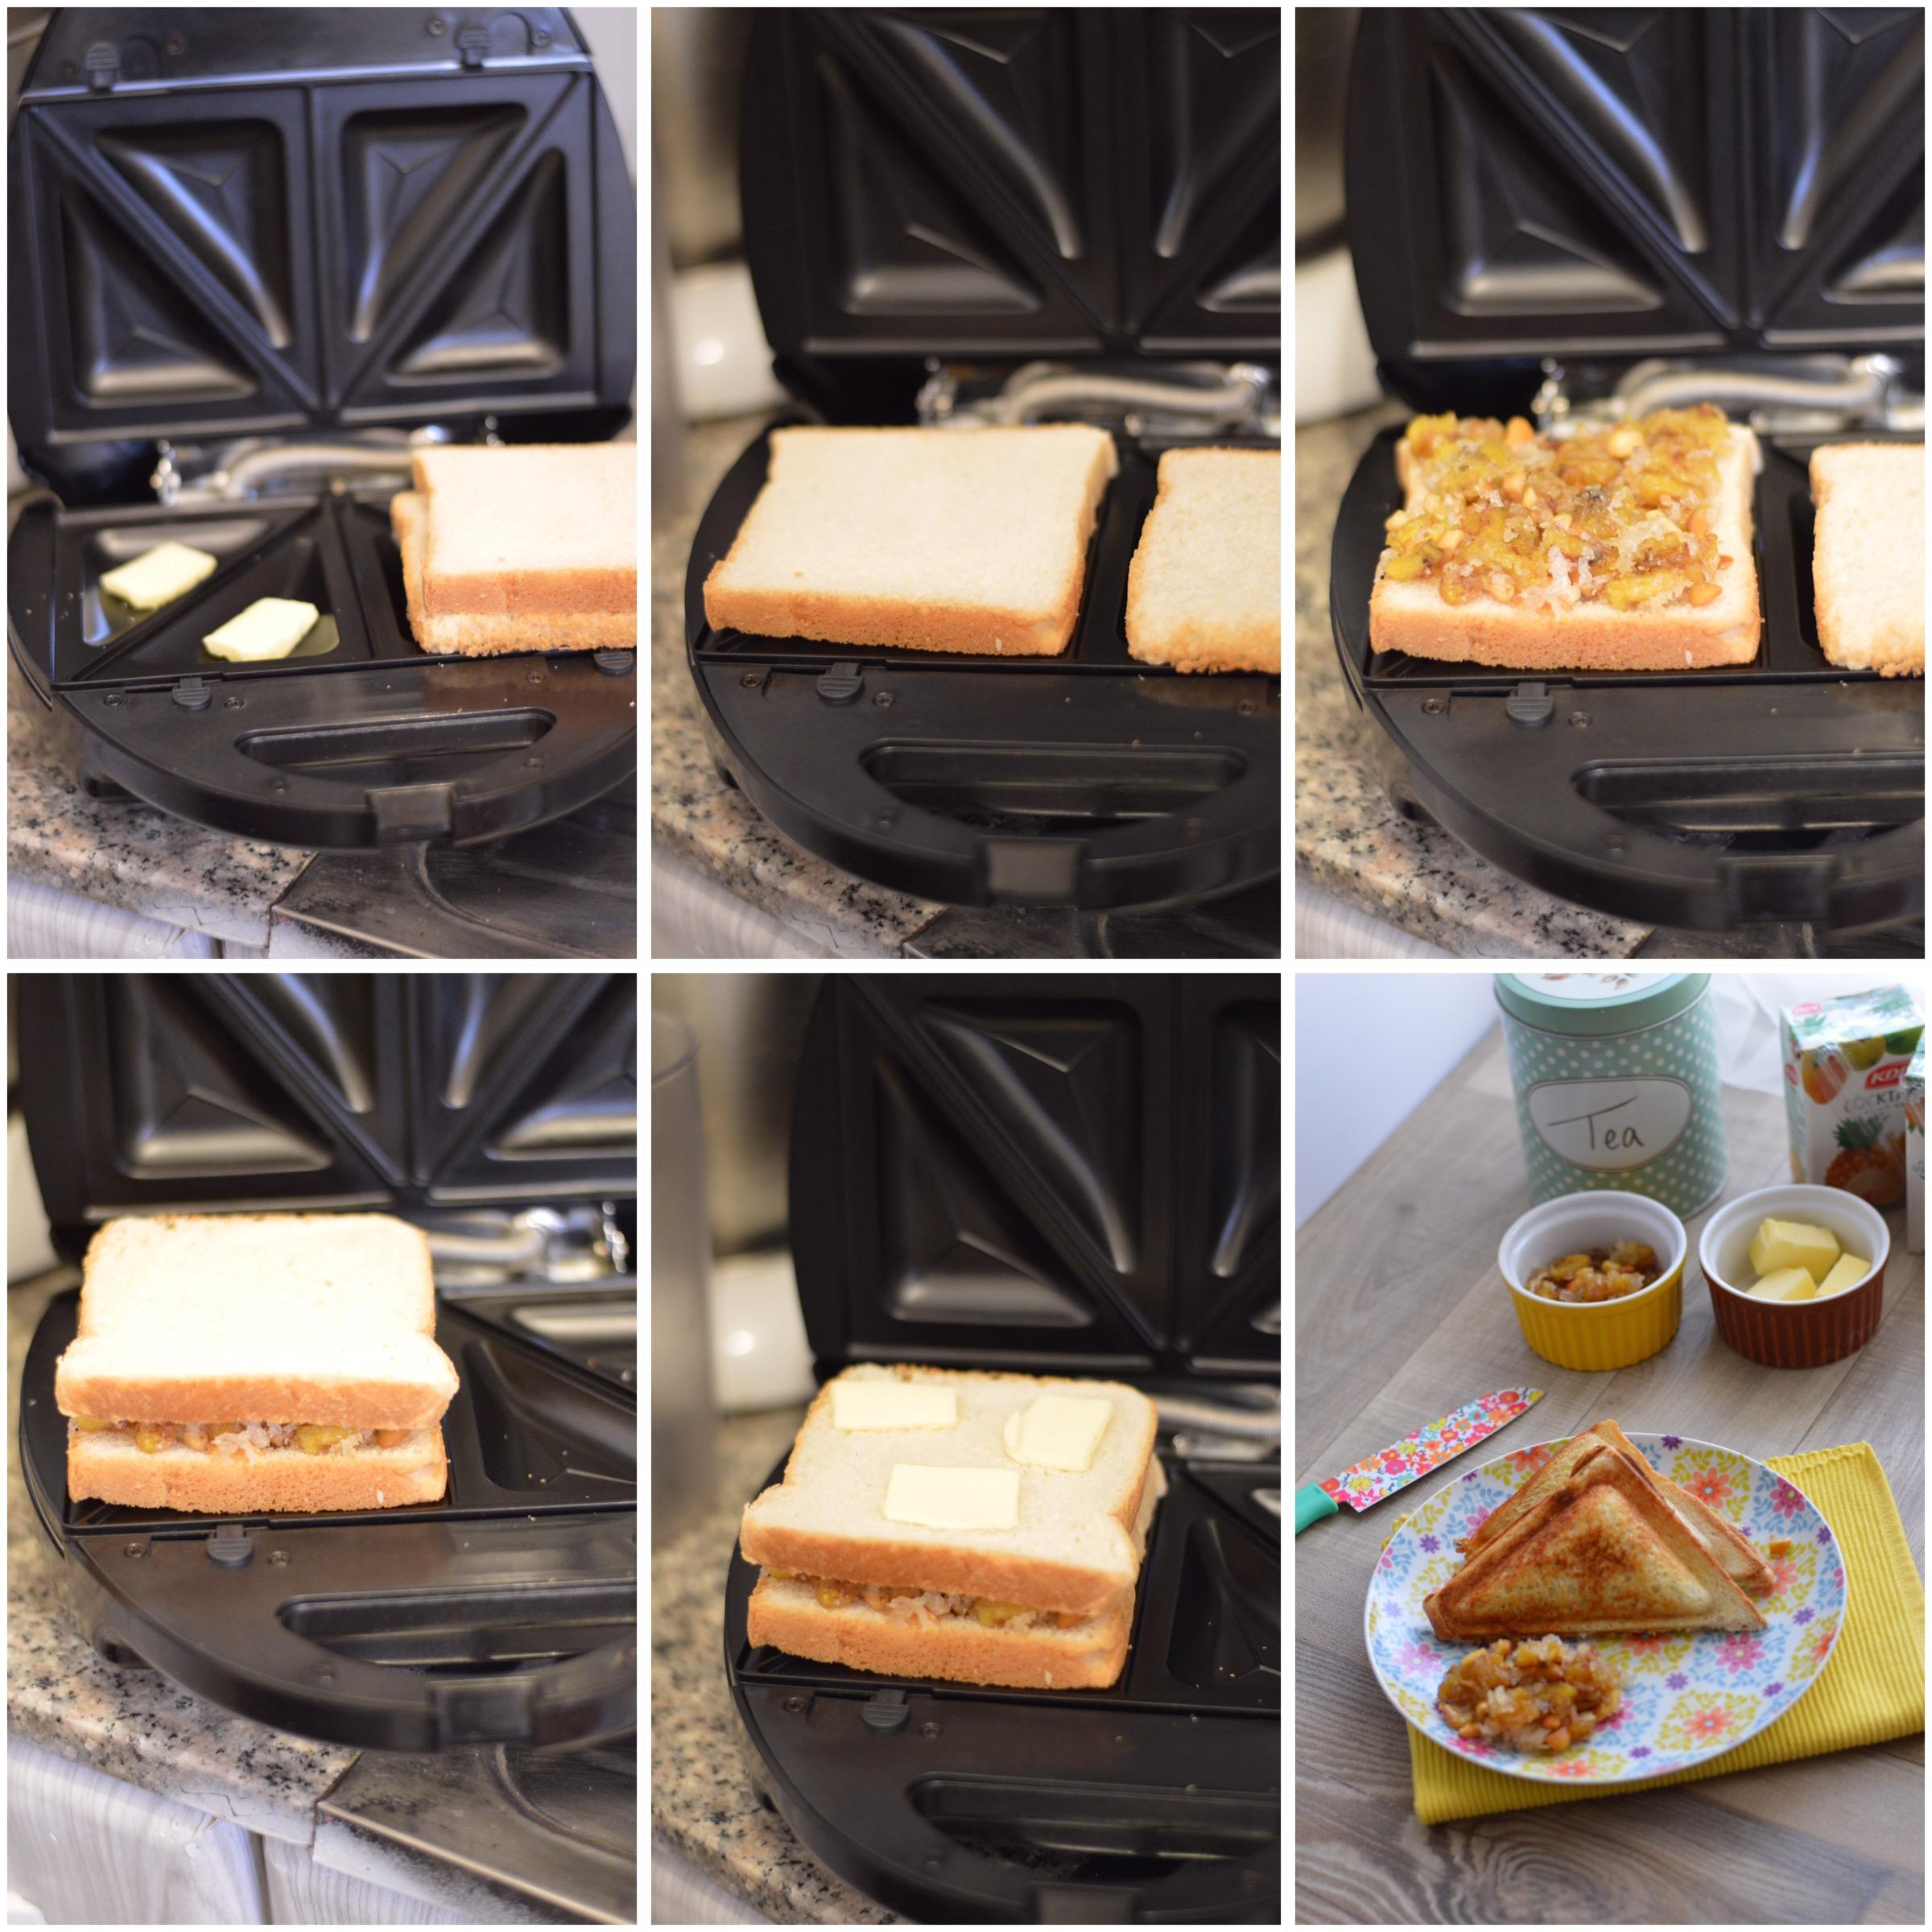 Food Gets Stuck From Sugar Bread